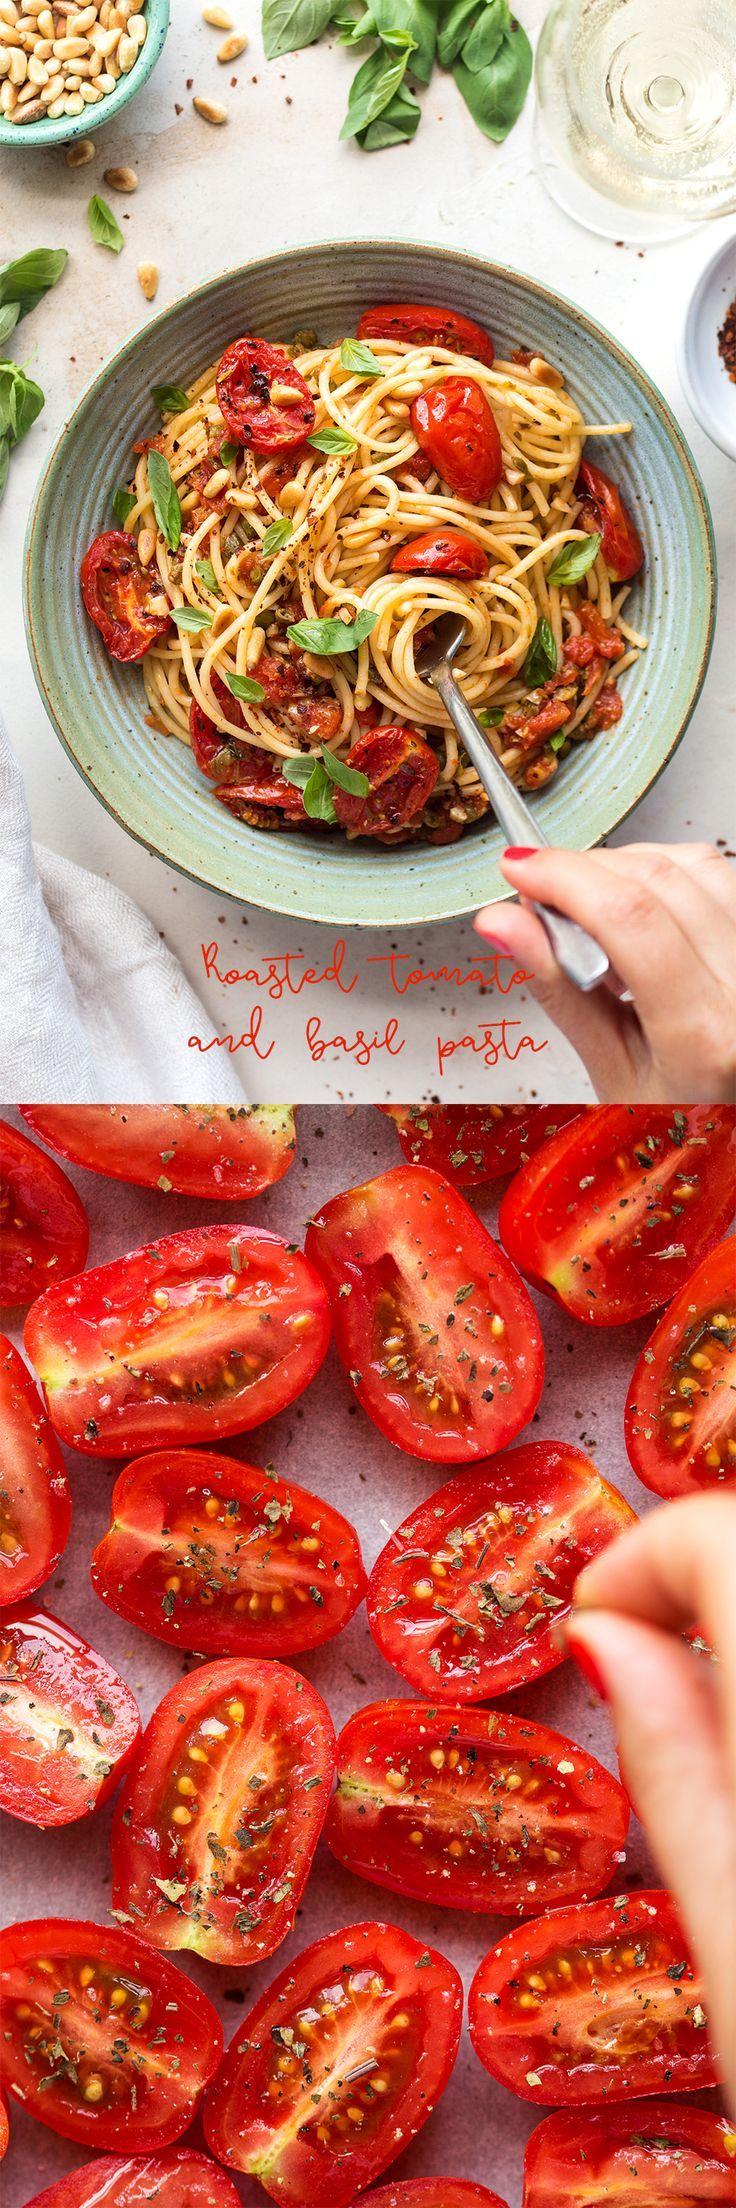 Photo of Roasted tomato and basil pasta – Lazy Cat Kitchen